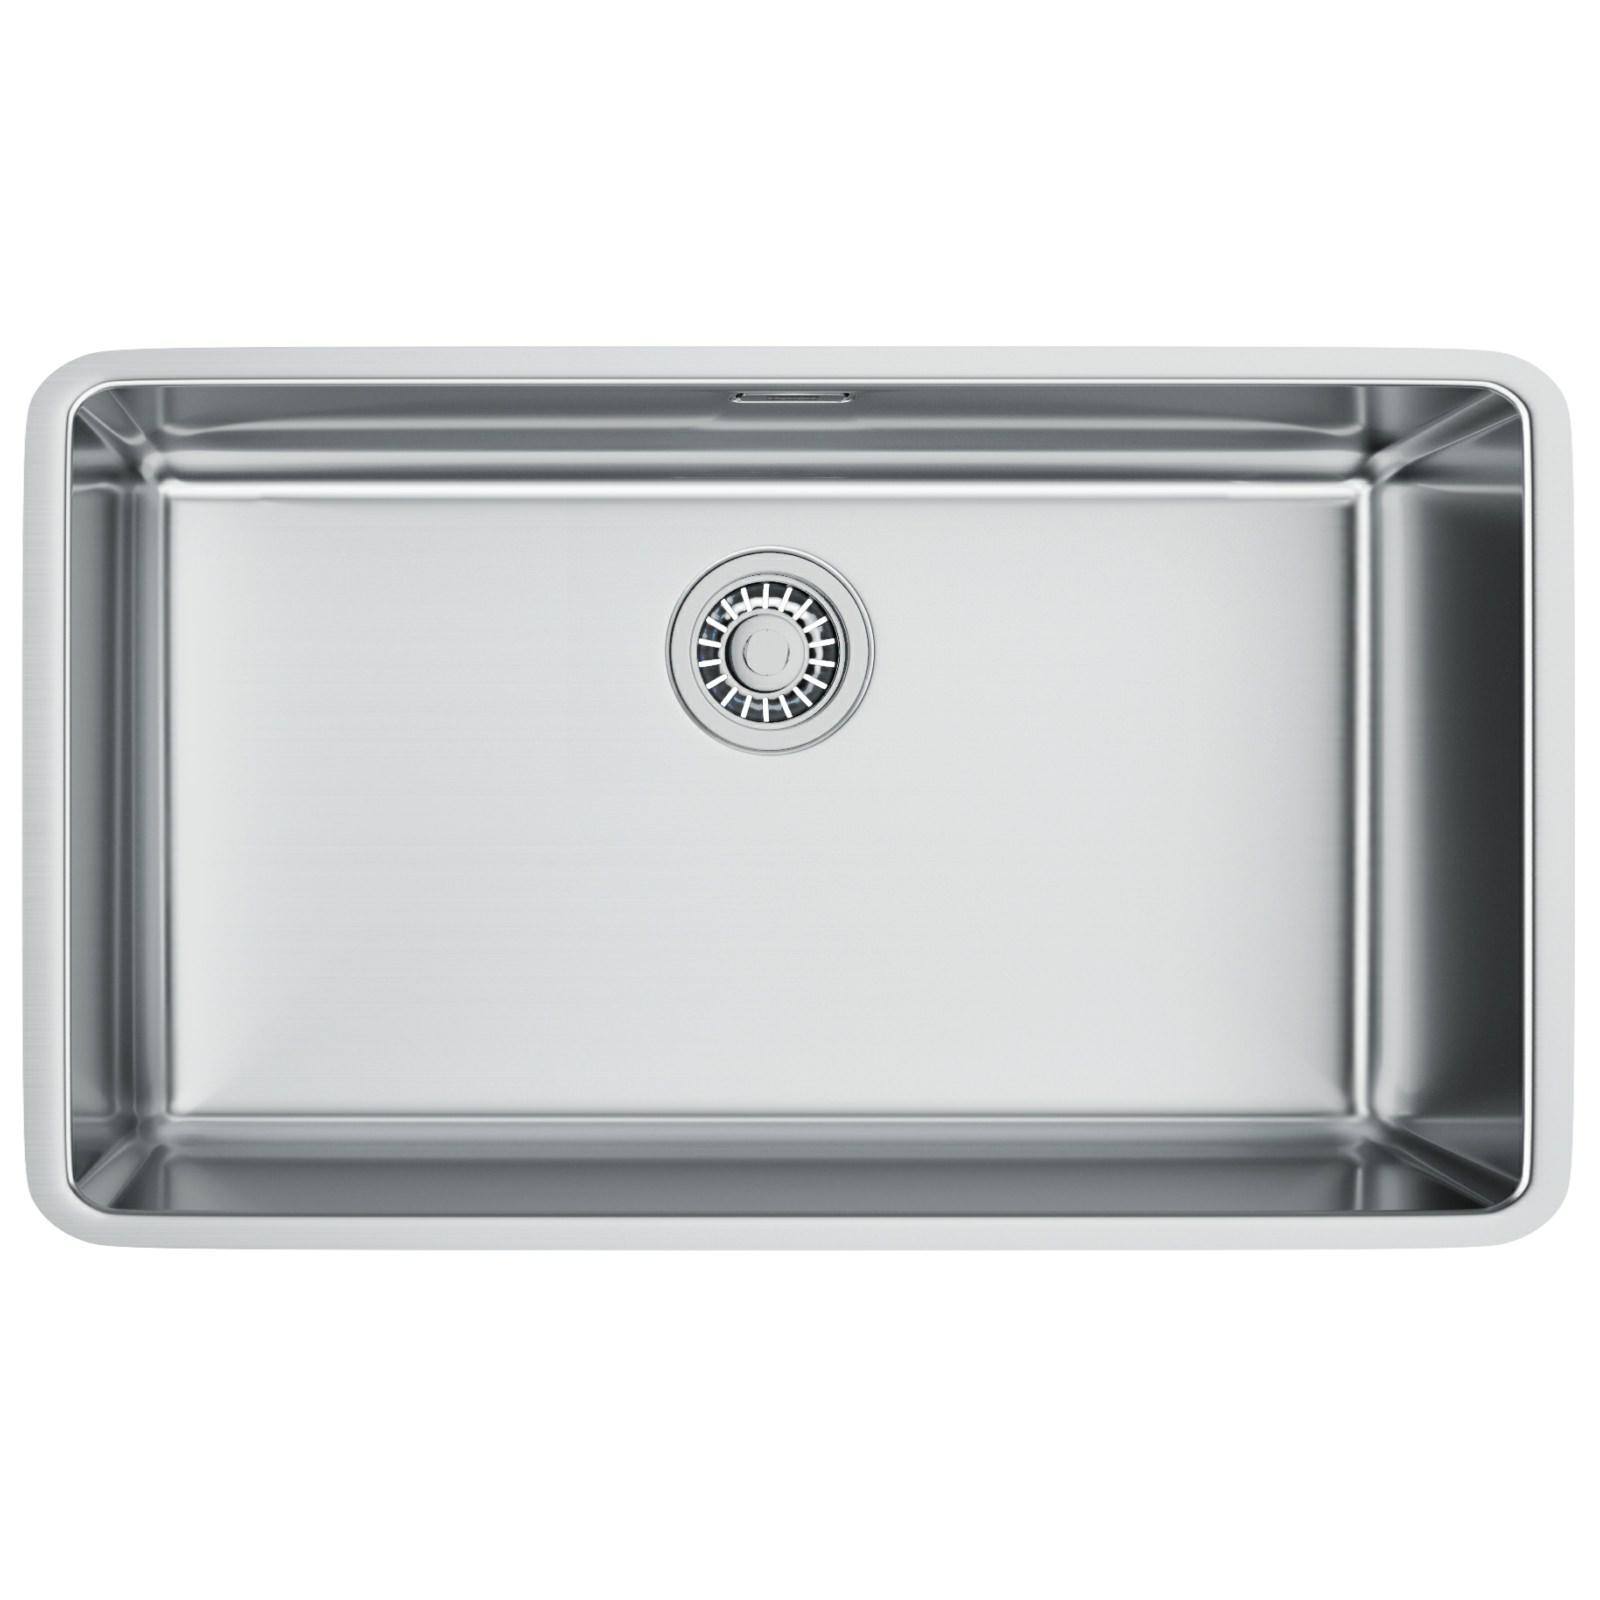 Hole Kitchen Sink Stainless Steel